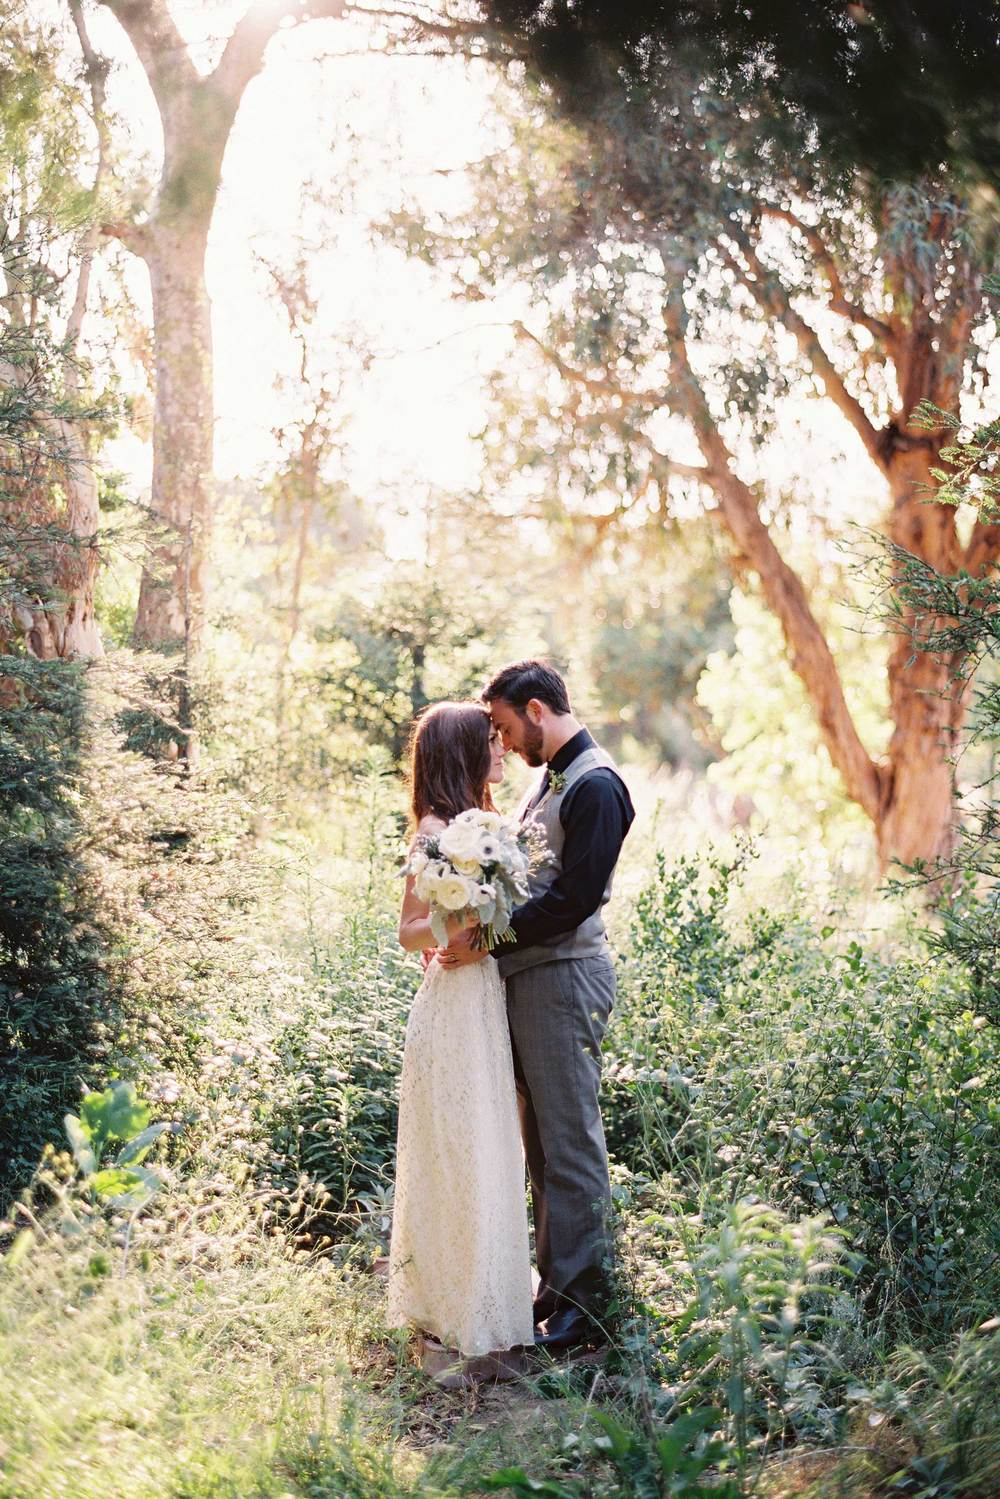 outdoor-wedding-14-of-the-flowers.jpg